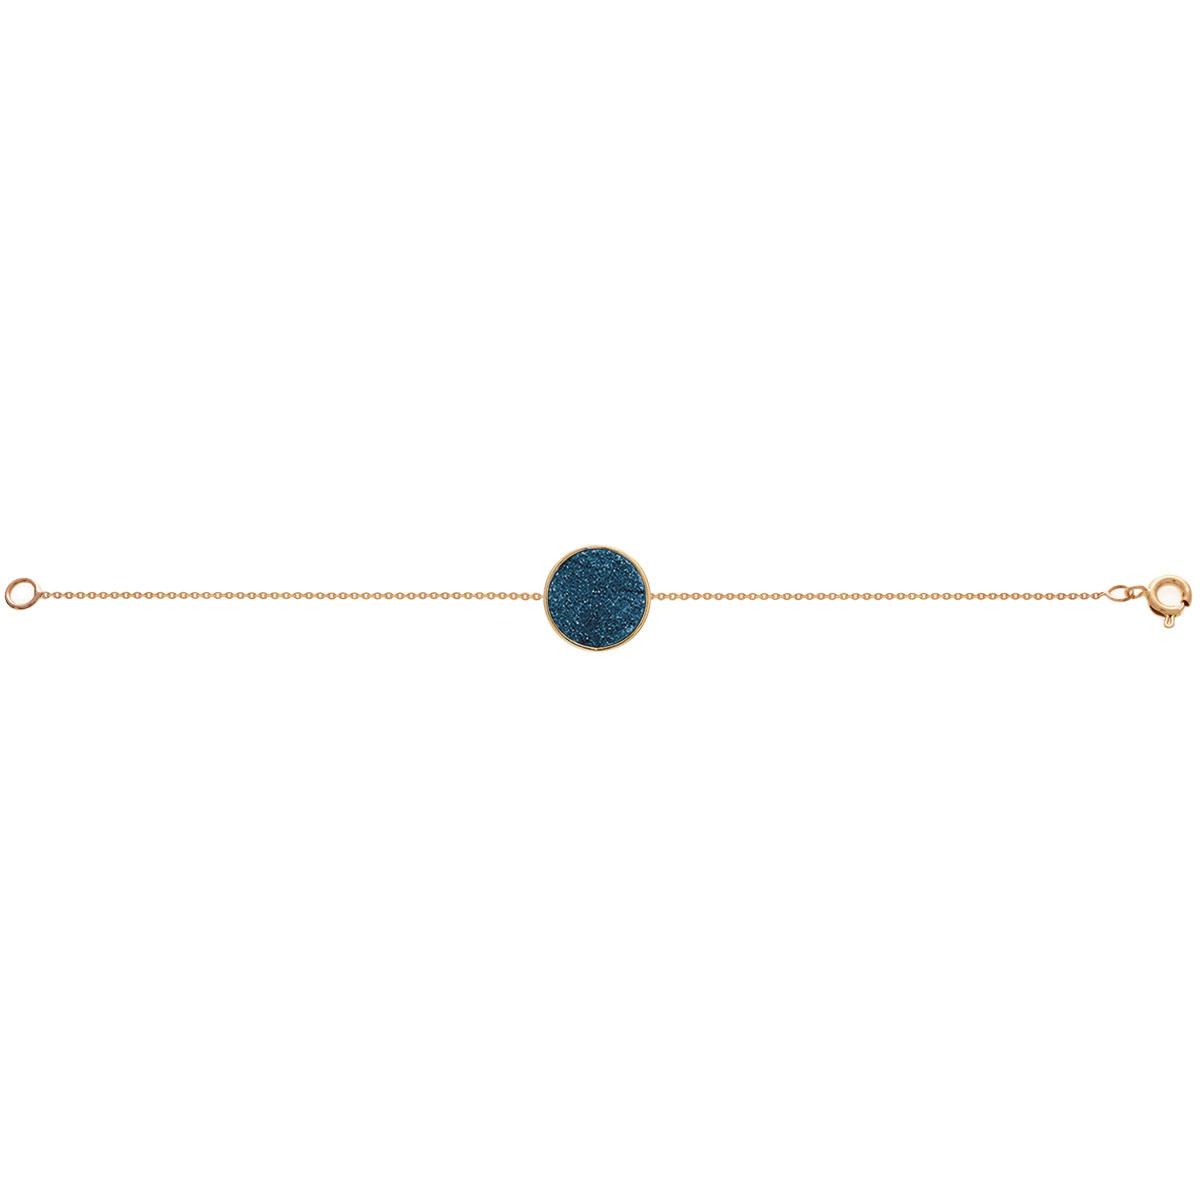 دستبند طلا کوارتز آبی کوچک